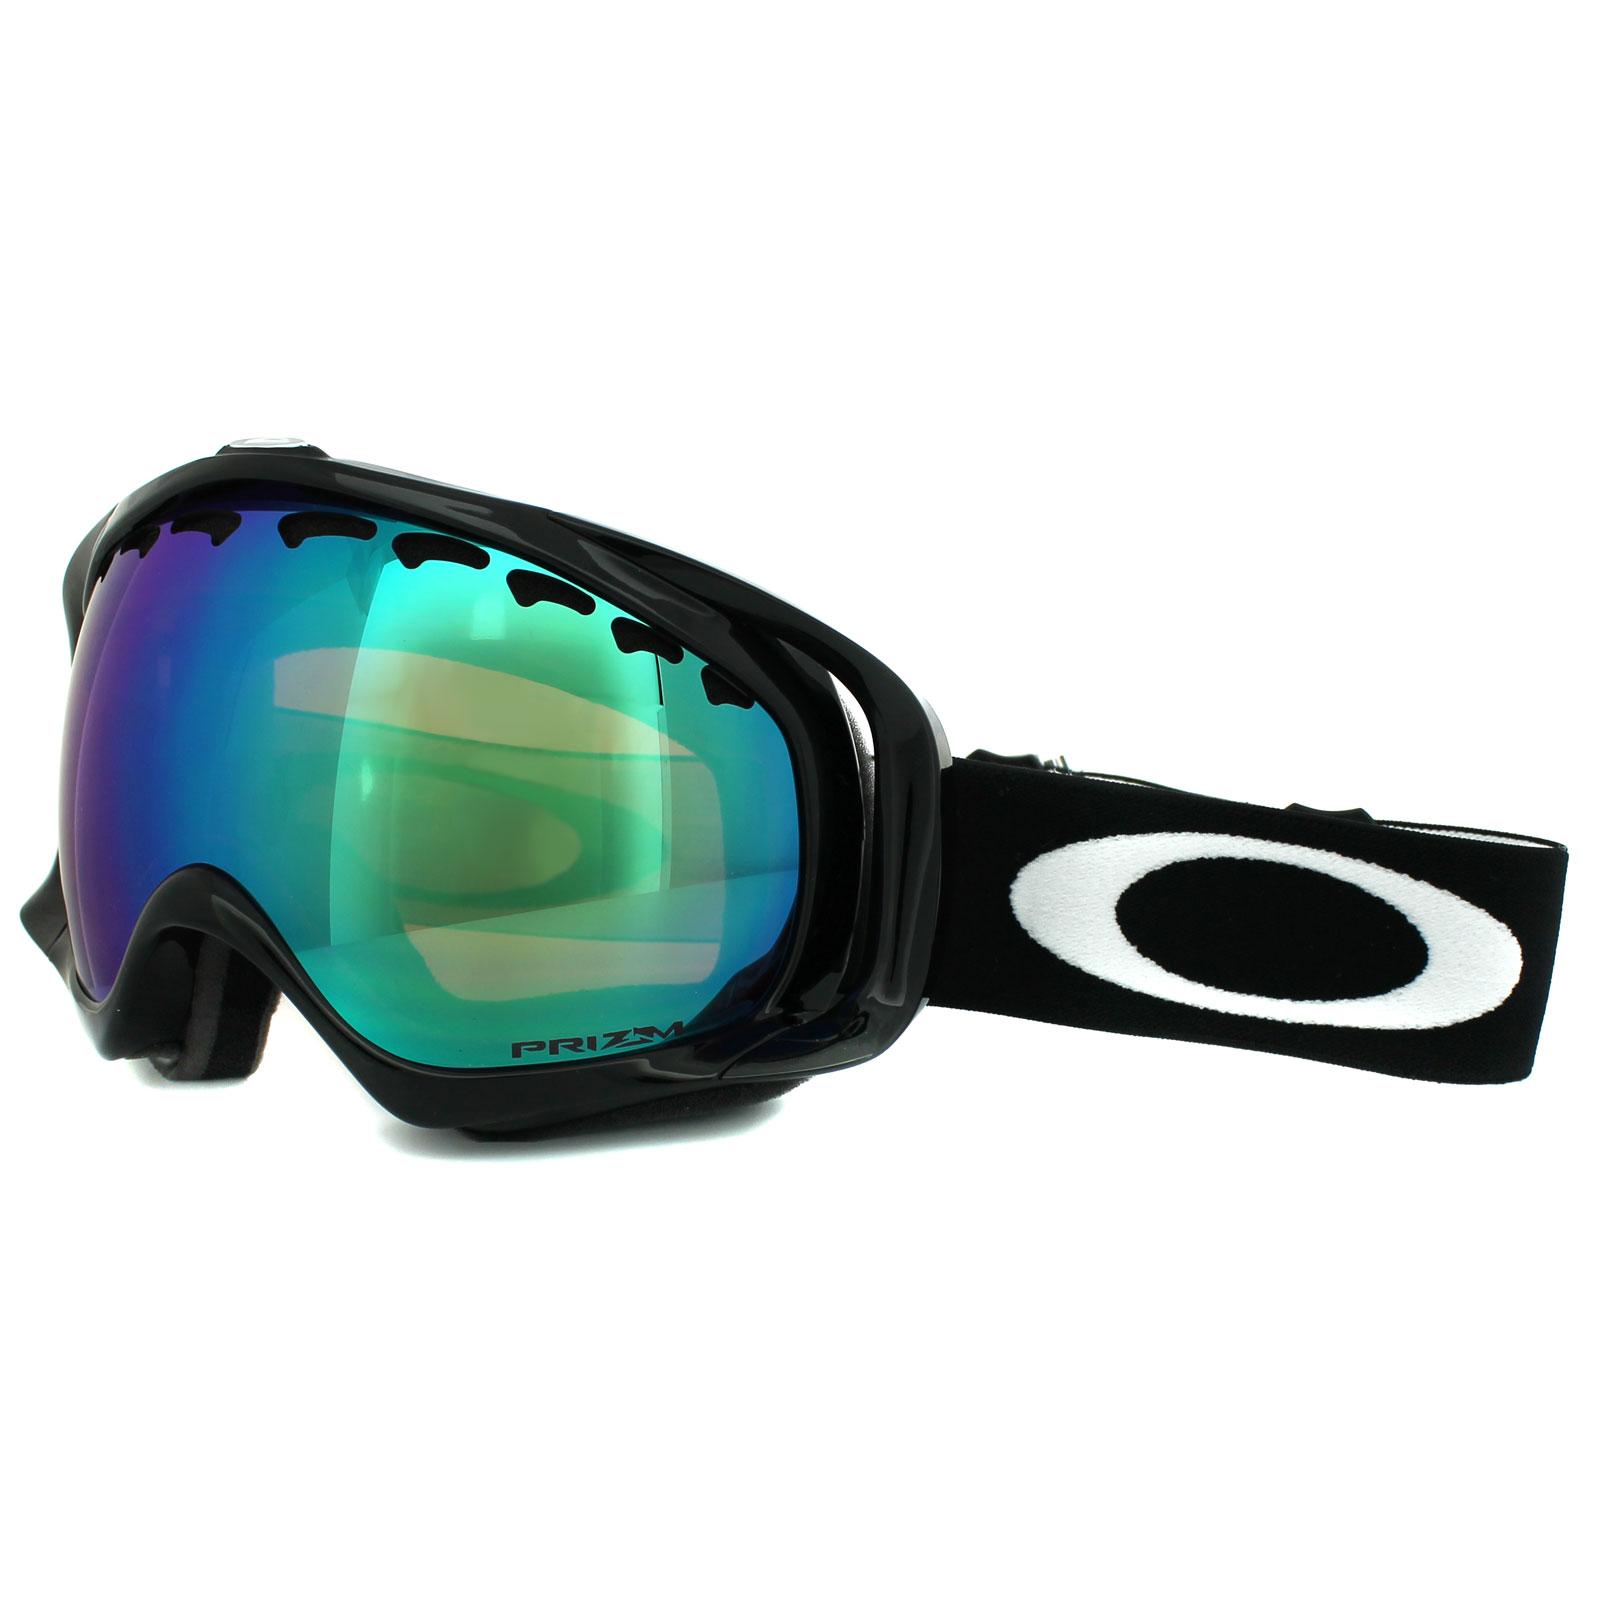 f5130954c88 Cheap Oakley Crowbar Goggles - Discounted Sunglasses